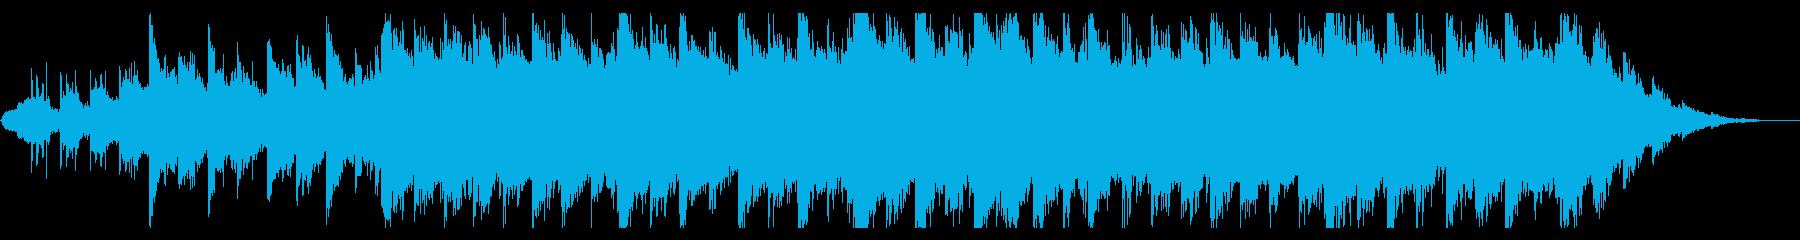 JapaneseStyle1の再生済みの波形